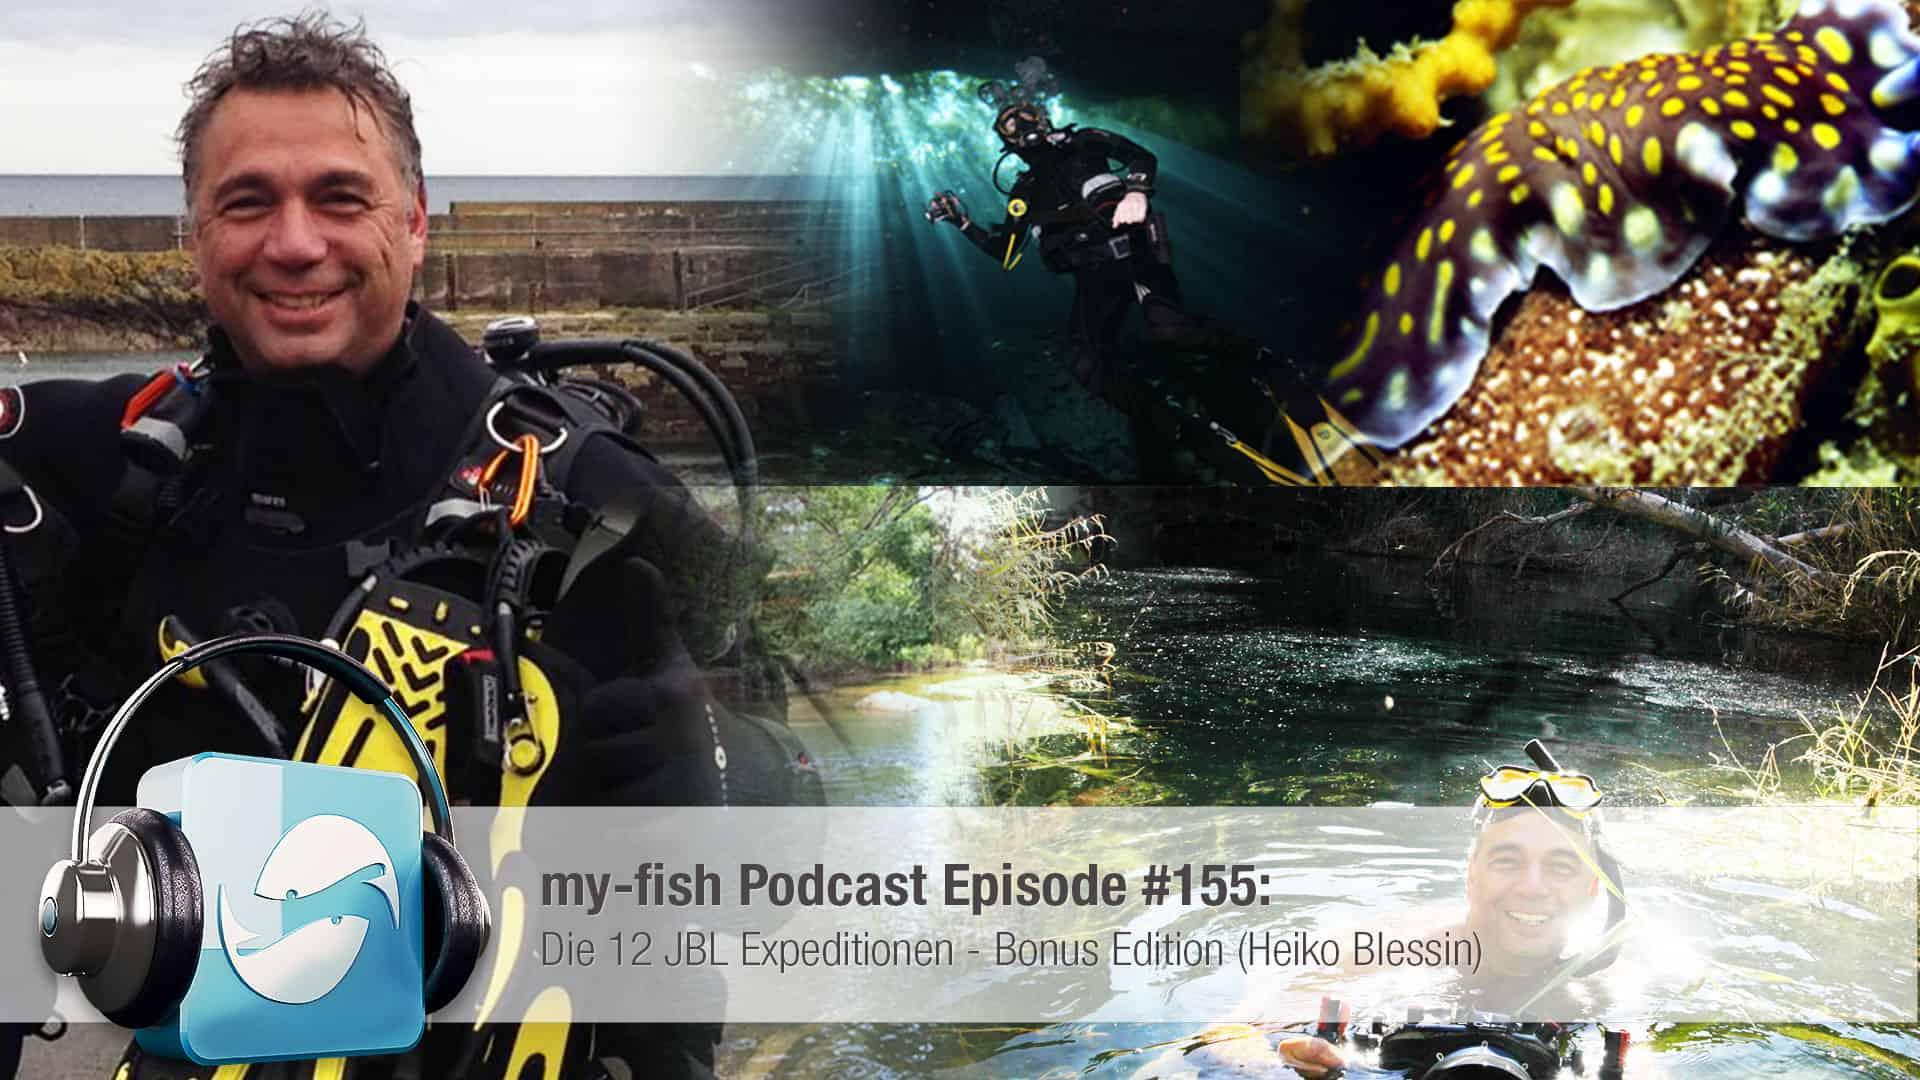 Podcast Episode #155 : Die 12 JBL Expeditionen - Bonus Edition (Heiko Blessin) 1